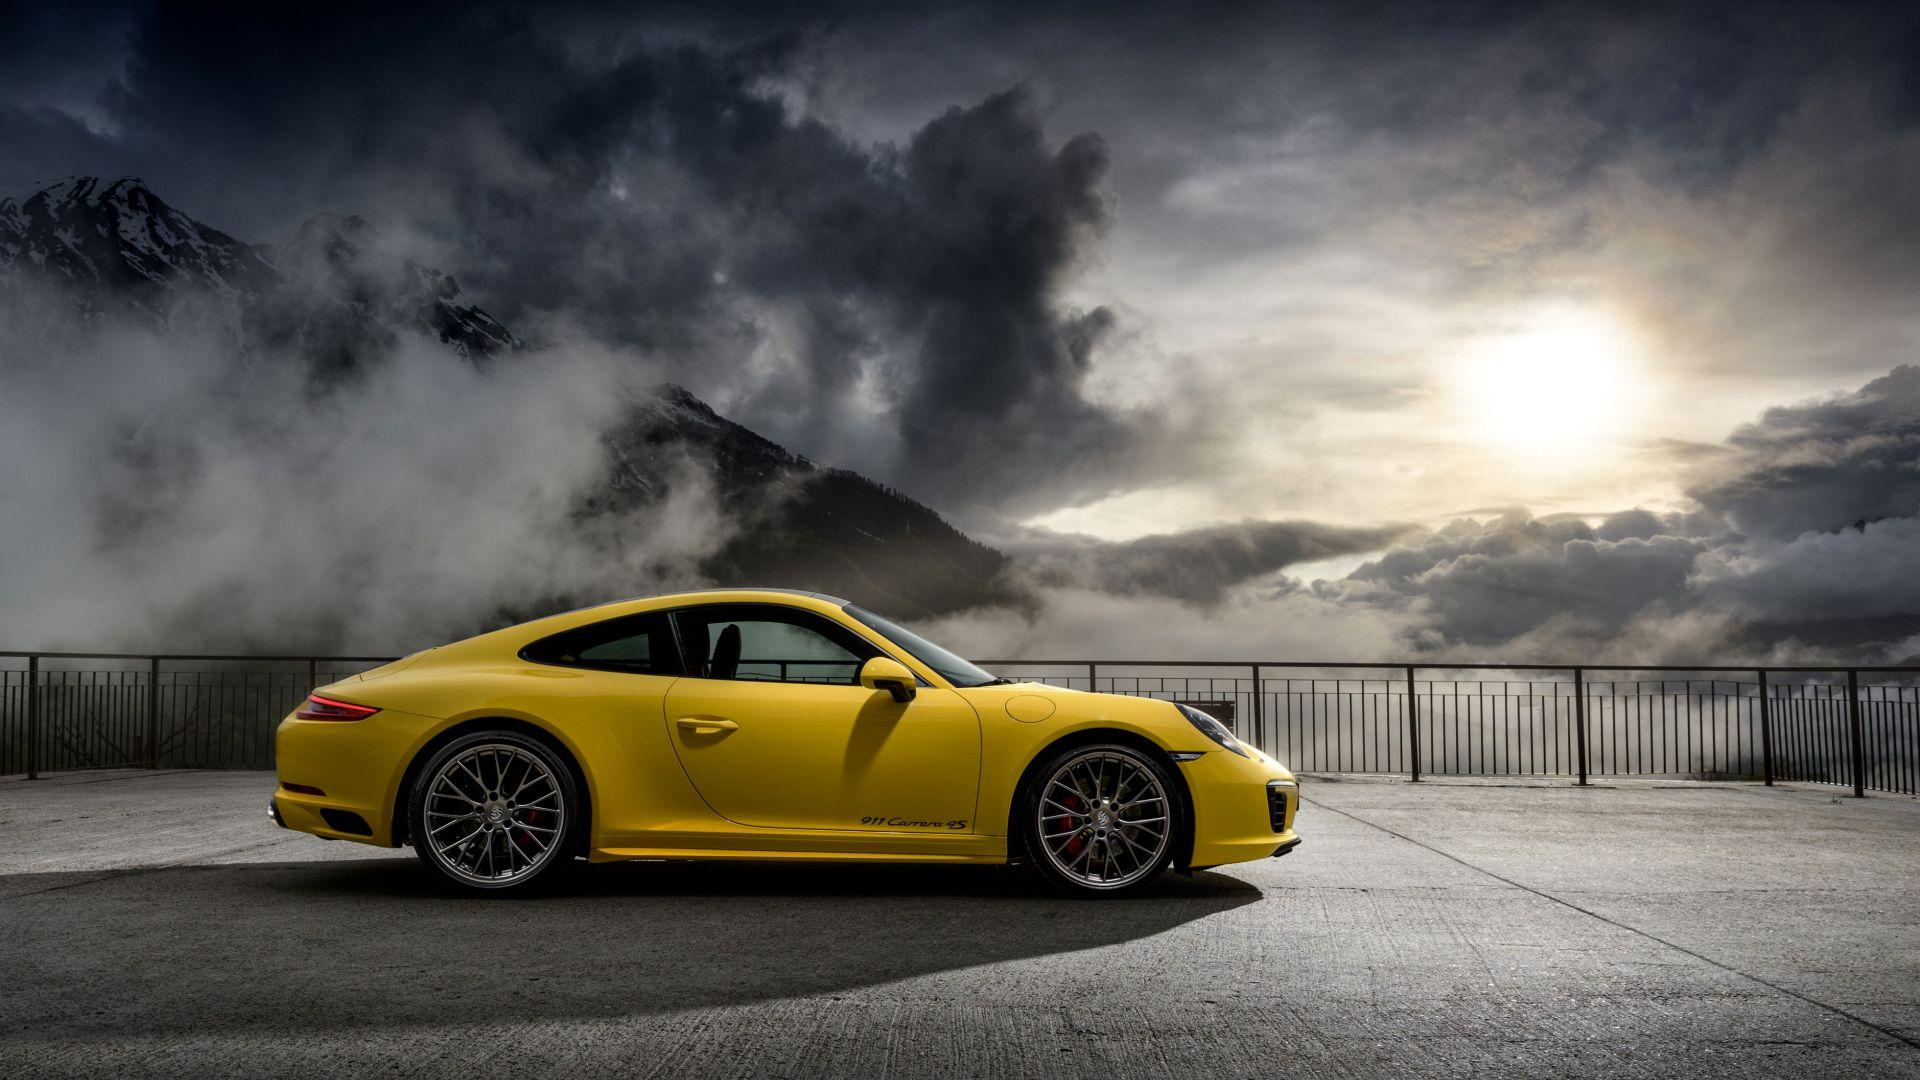 Awesome Porsche 911 Carrera 4 S, Yellow Sports Car, 4k Wallpaper